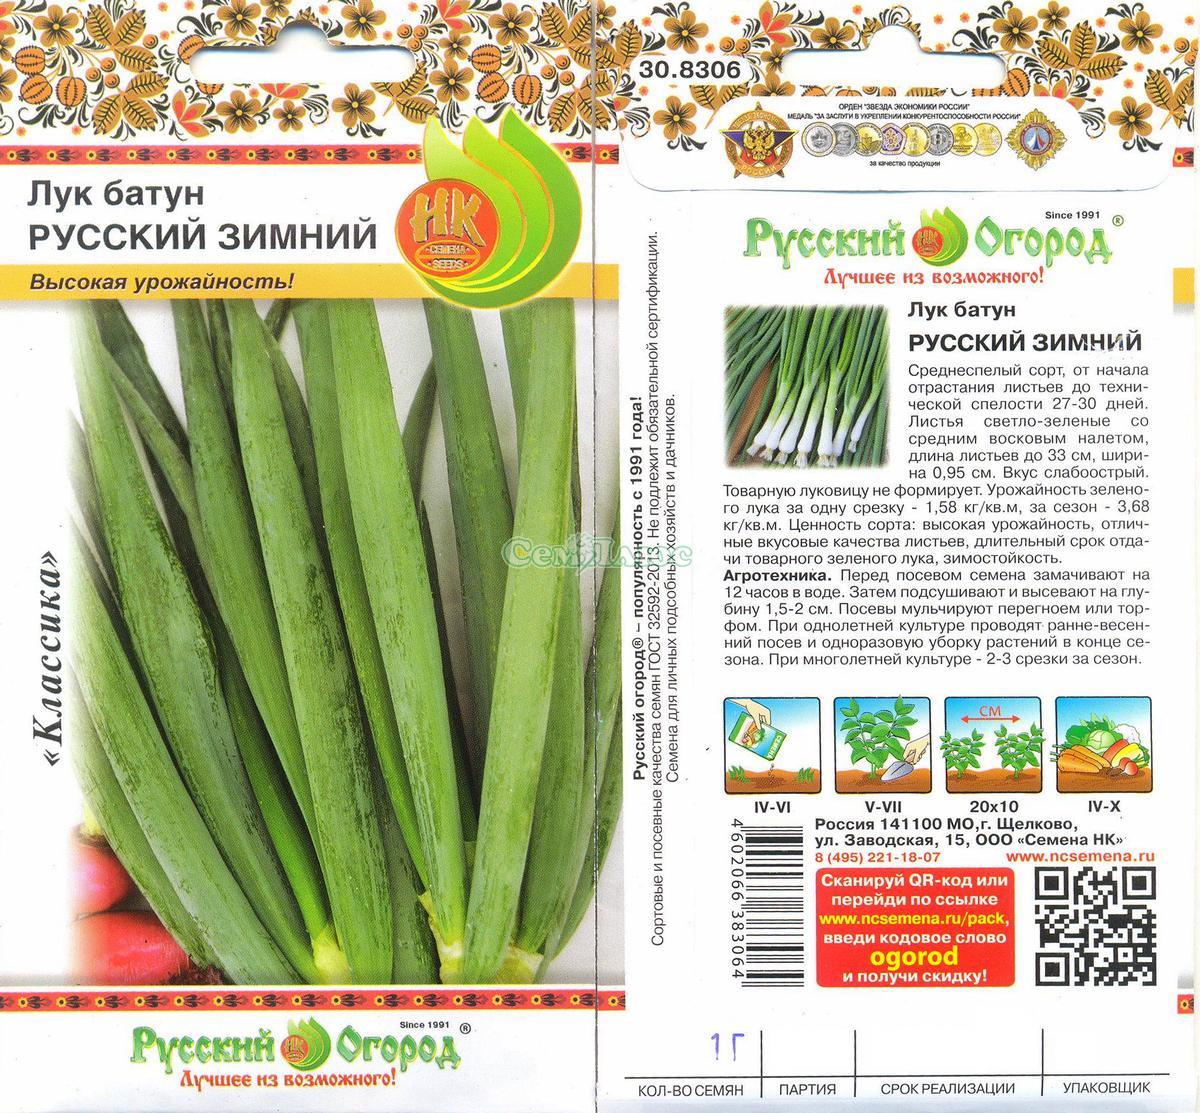 Лук батун русский зимний выращивание из семян 17